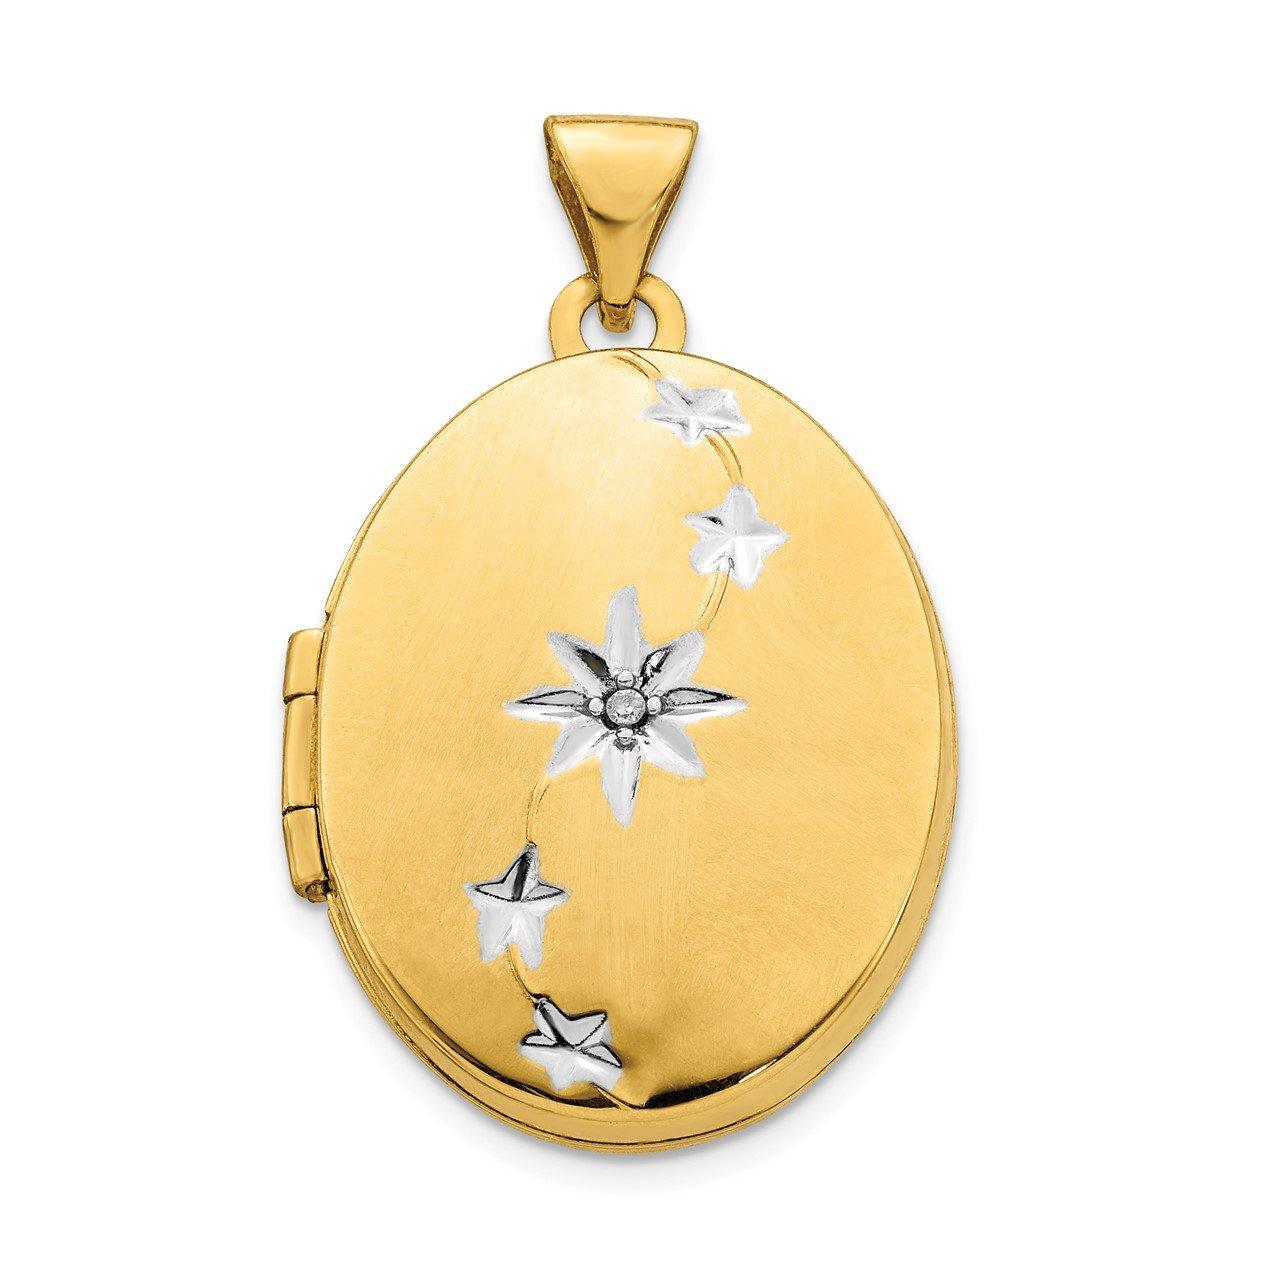 14K Yellow Gold and White Rhodium Brushed/Polished Diamond Stars Oval Locket